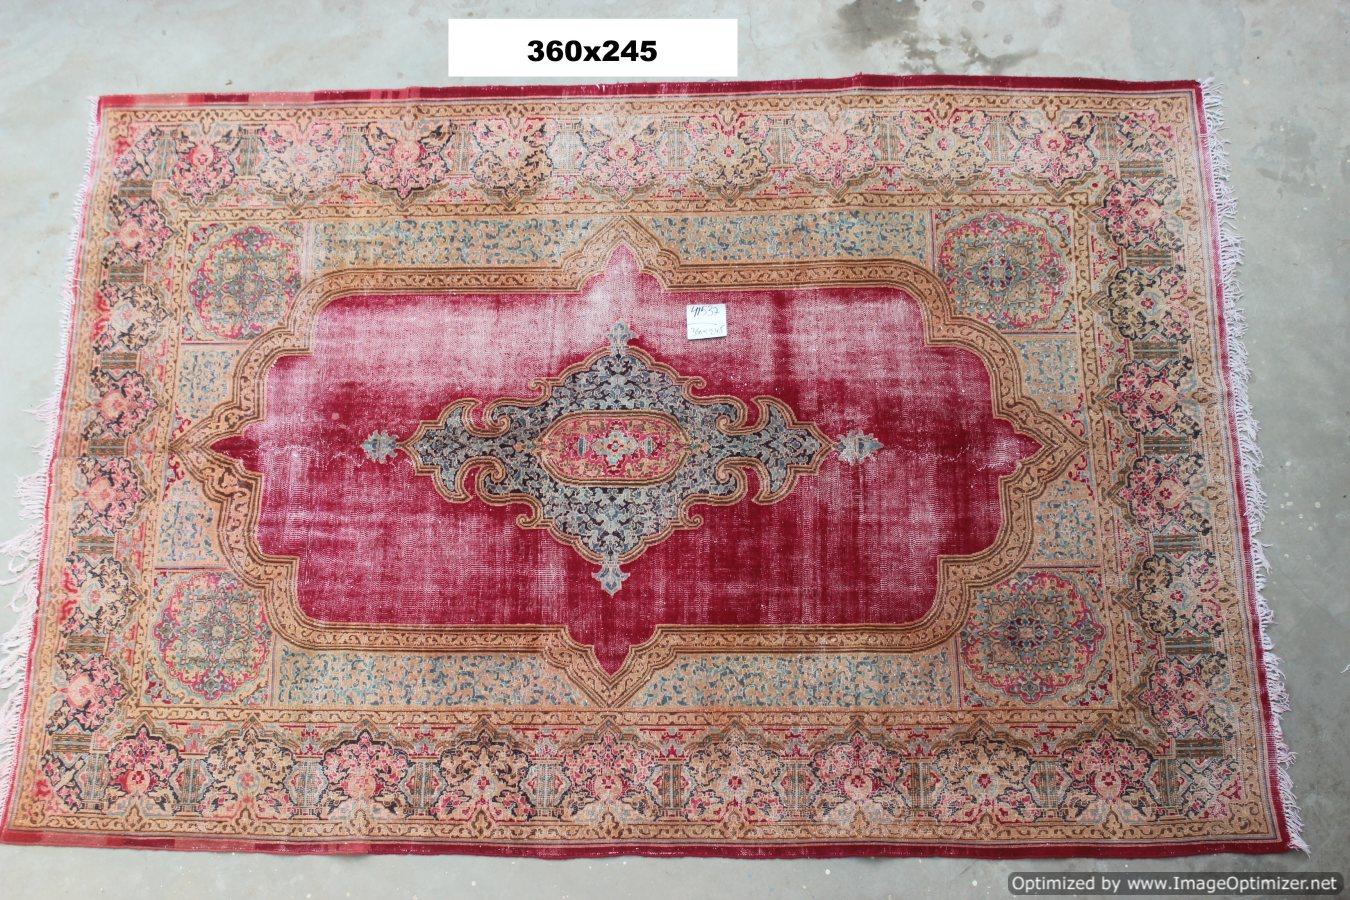 Vintage recoloured perzisch tapijt 41537 (360cm x 245cm)